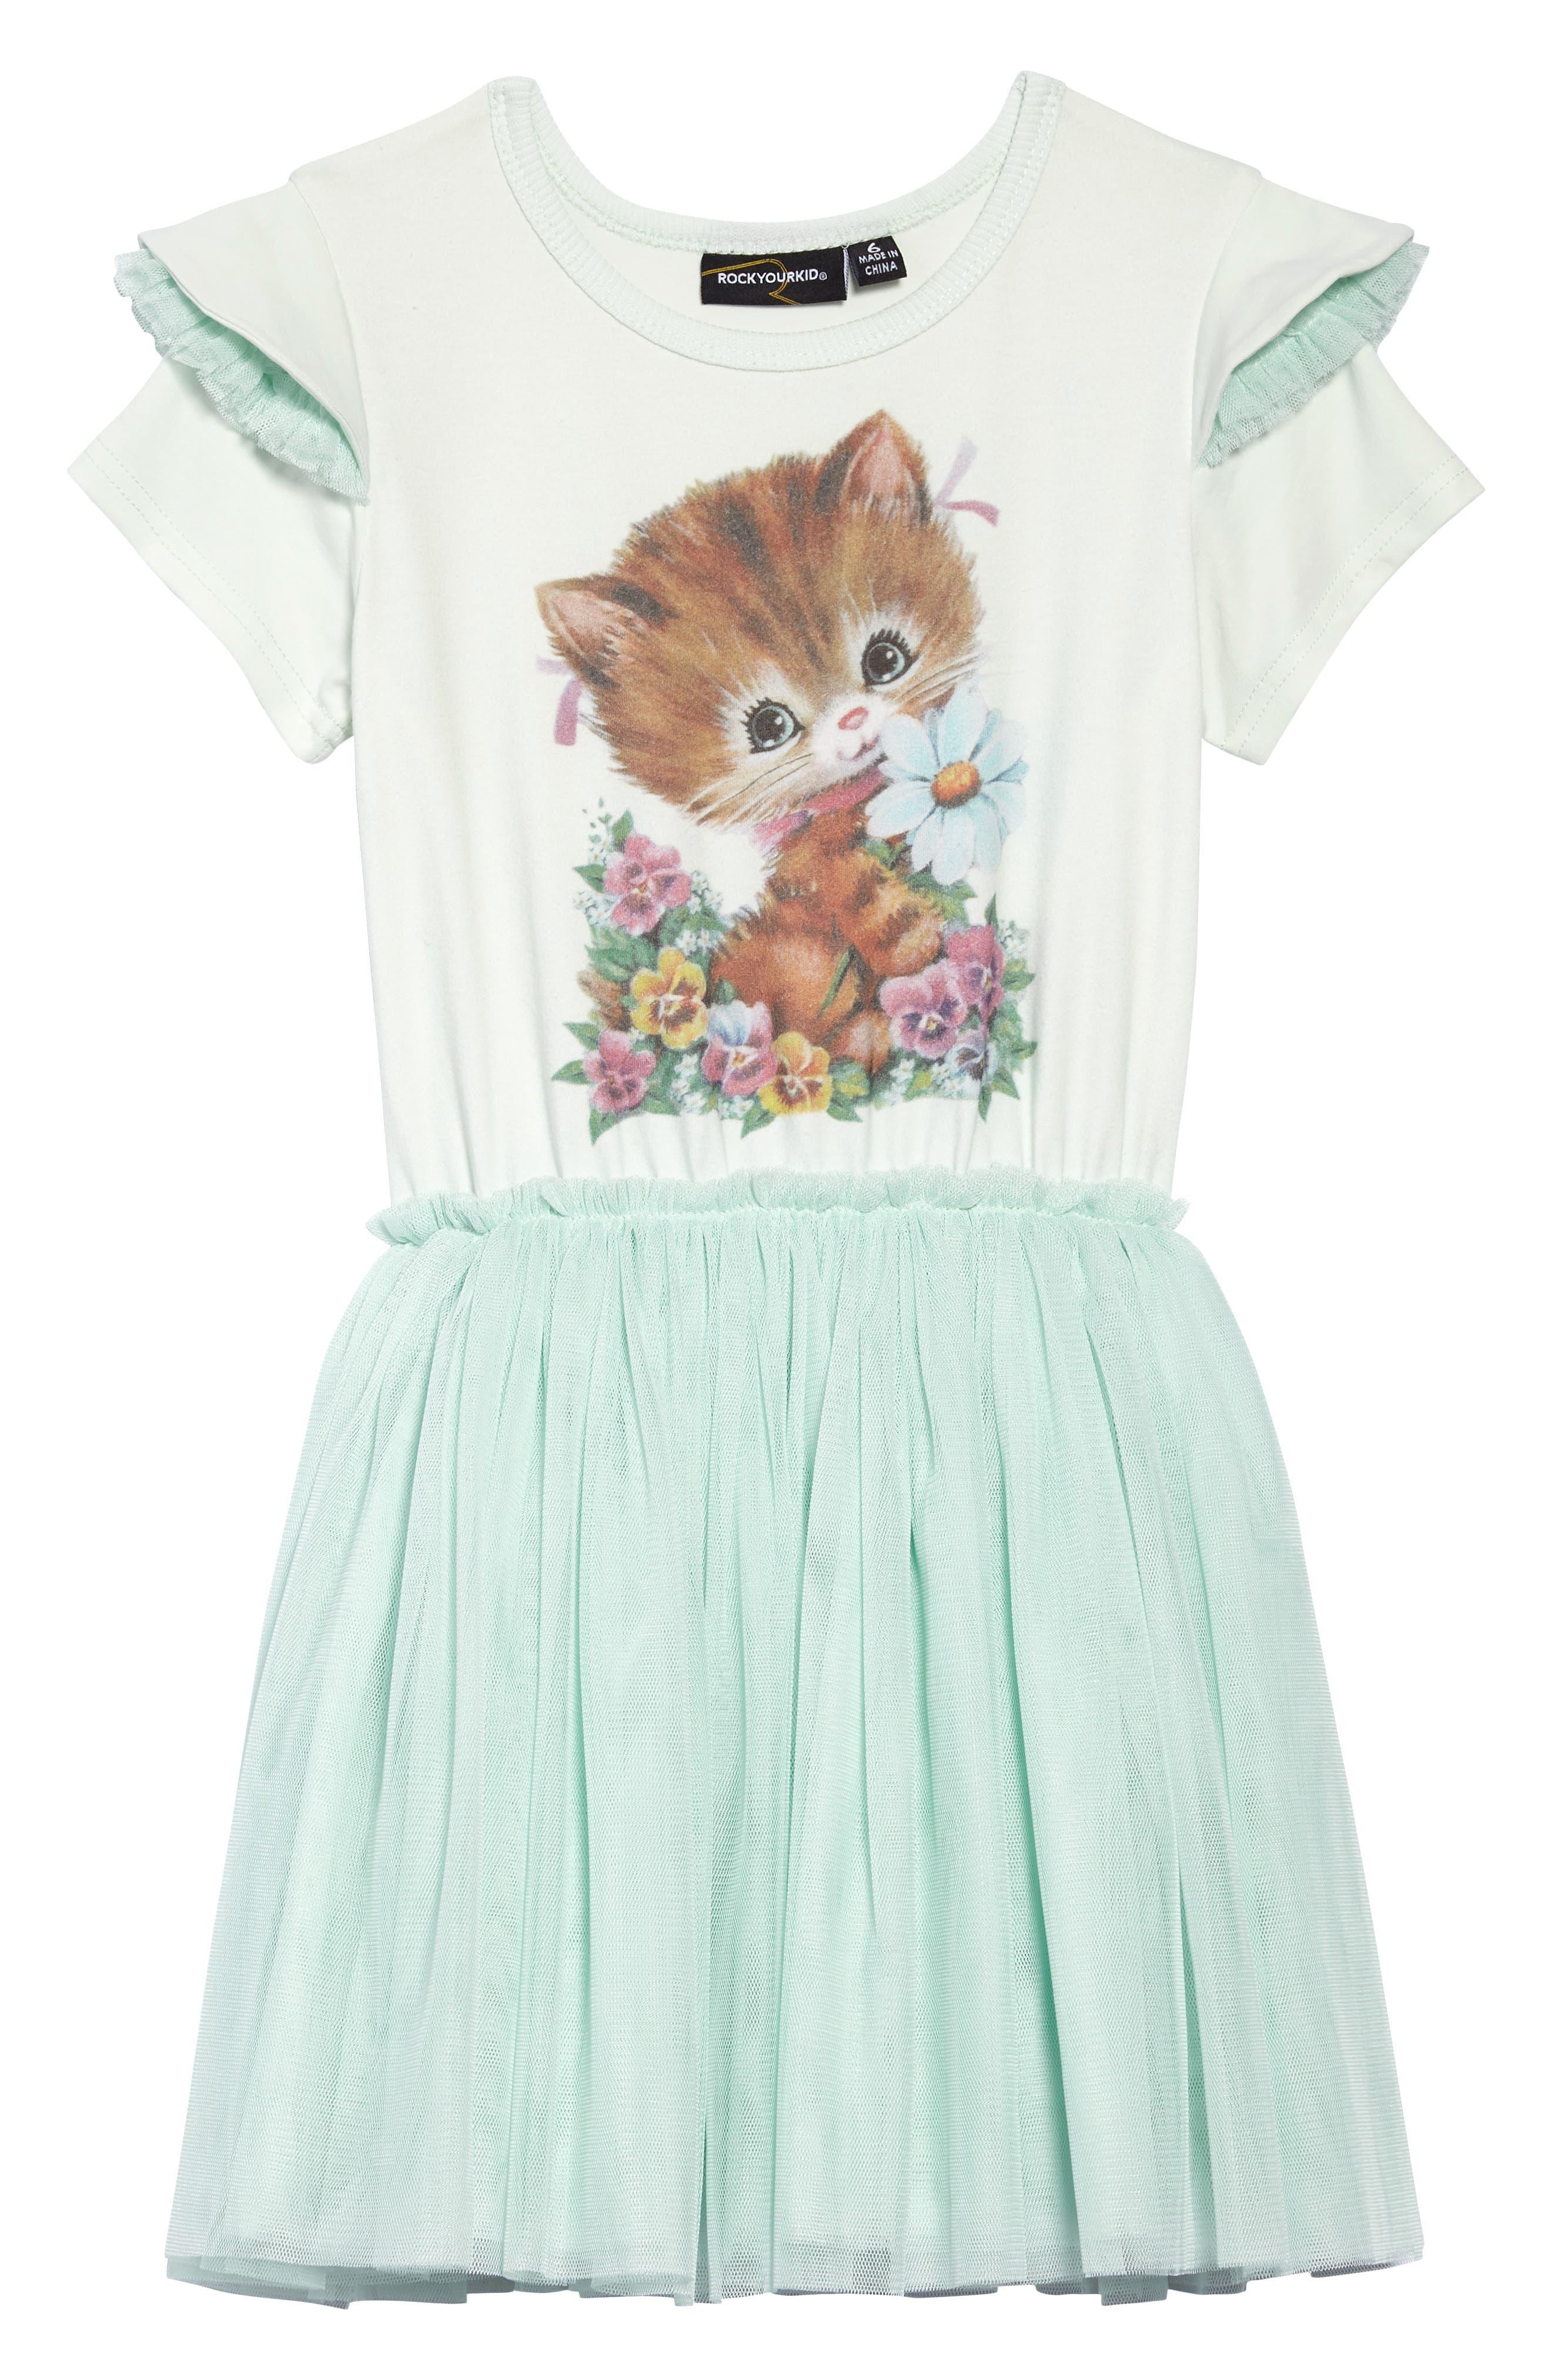 Kitty Kat Circus Dress,                             Main thumbnail 1, color,                             440